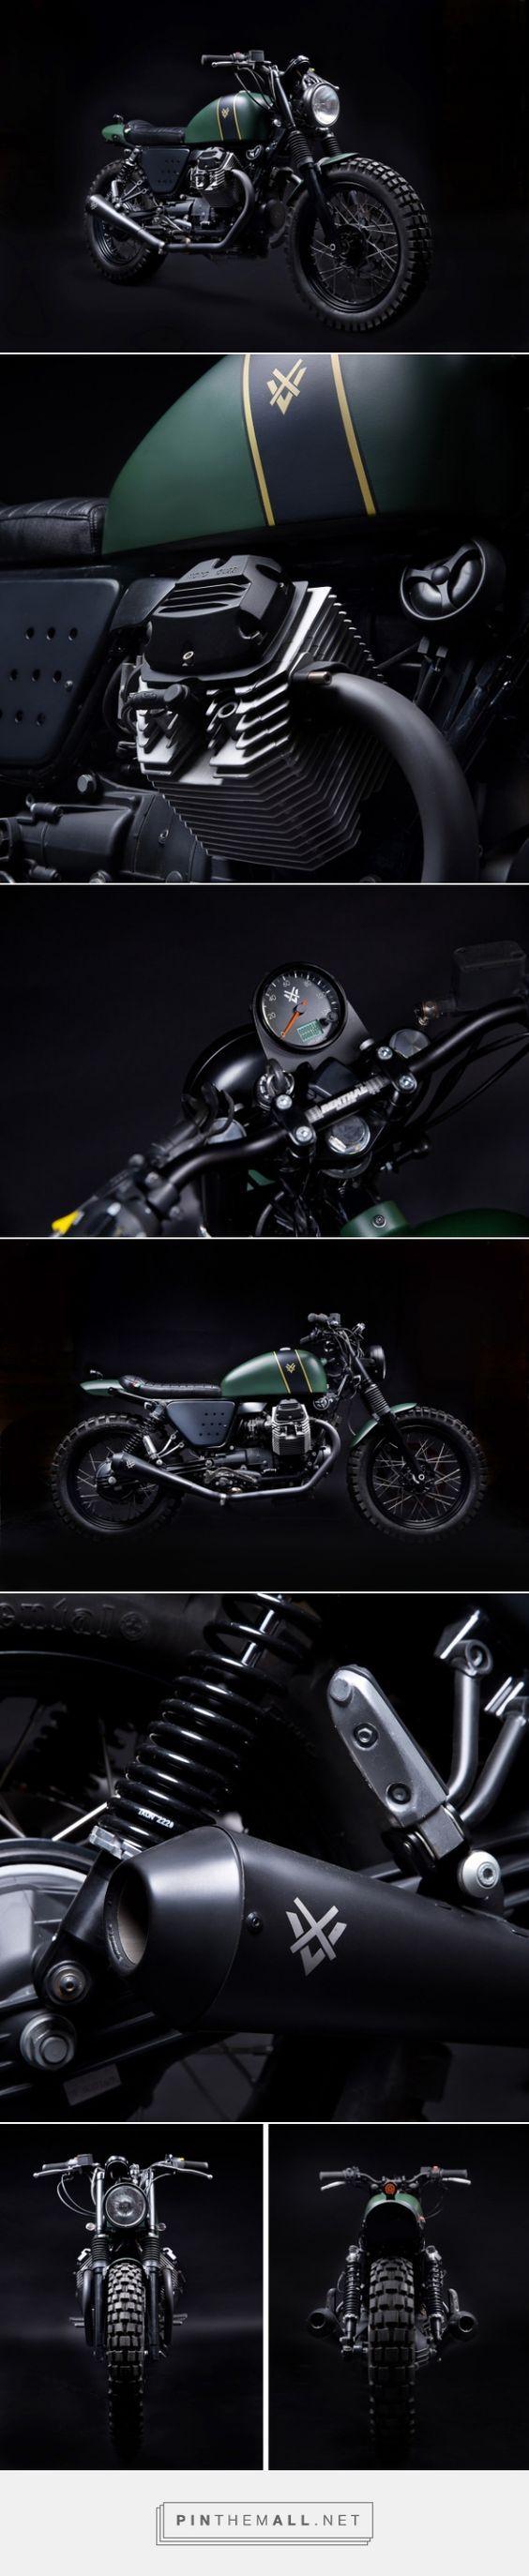 Venier Customs' Moto Guzzi 'Tractor 03' Click to read the full story